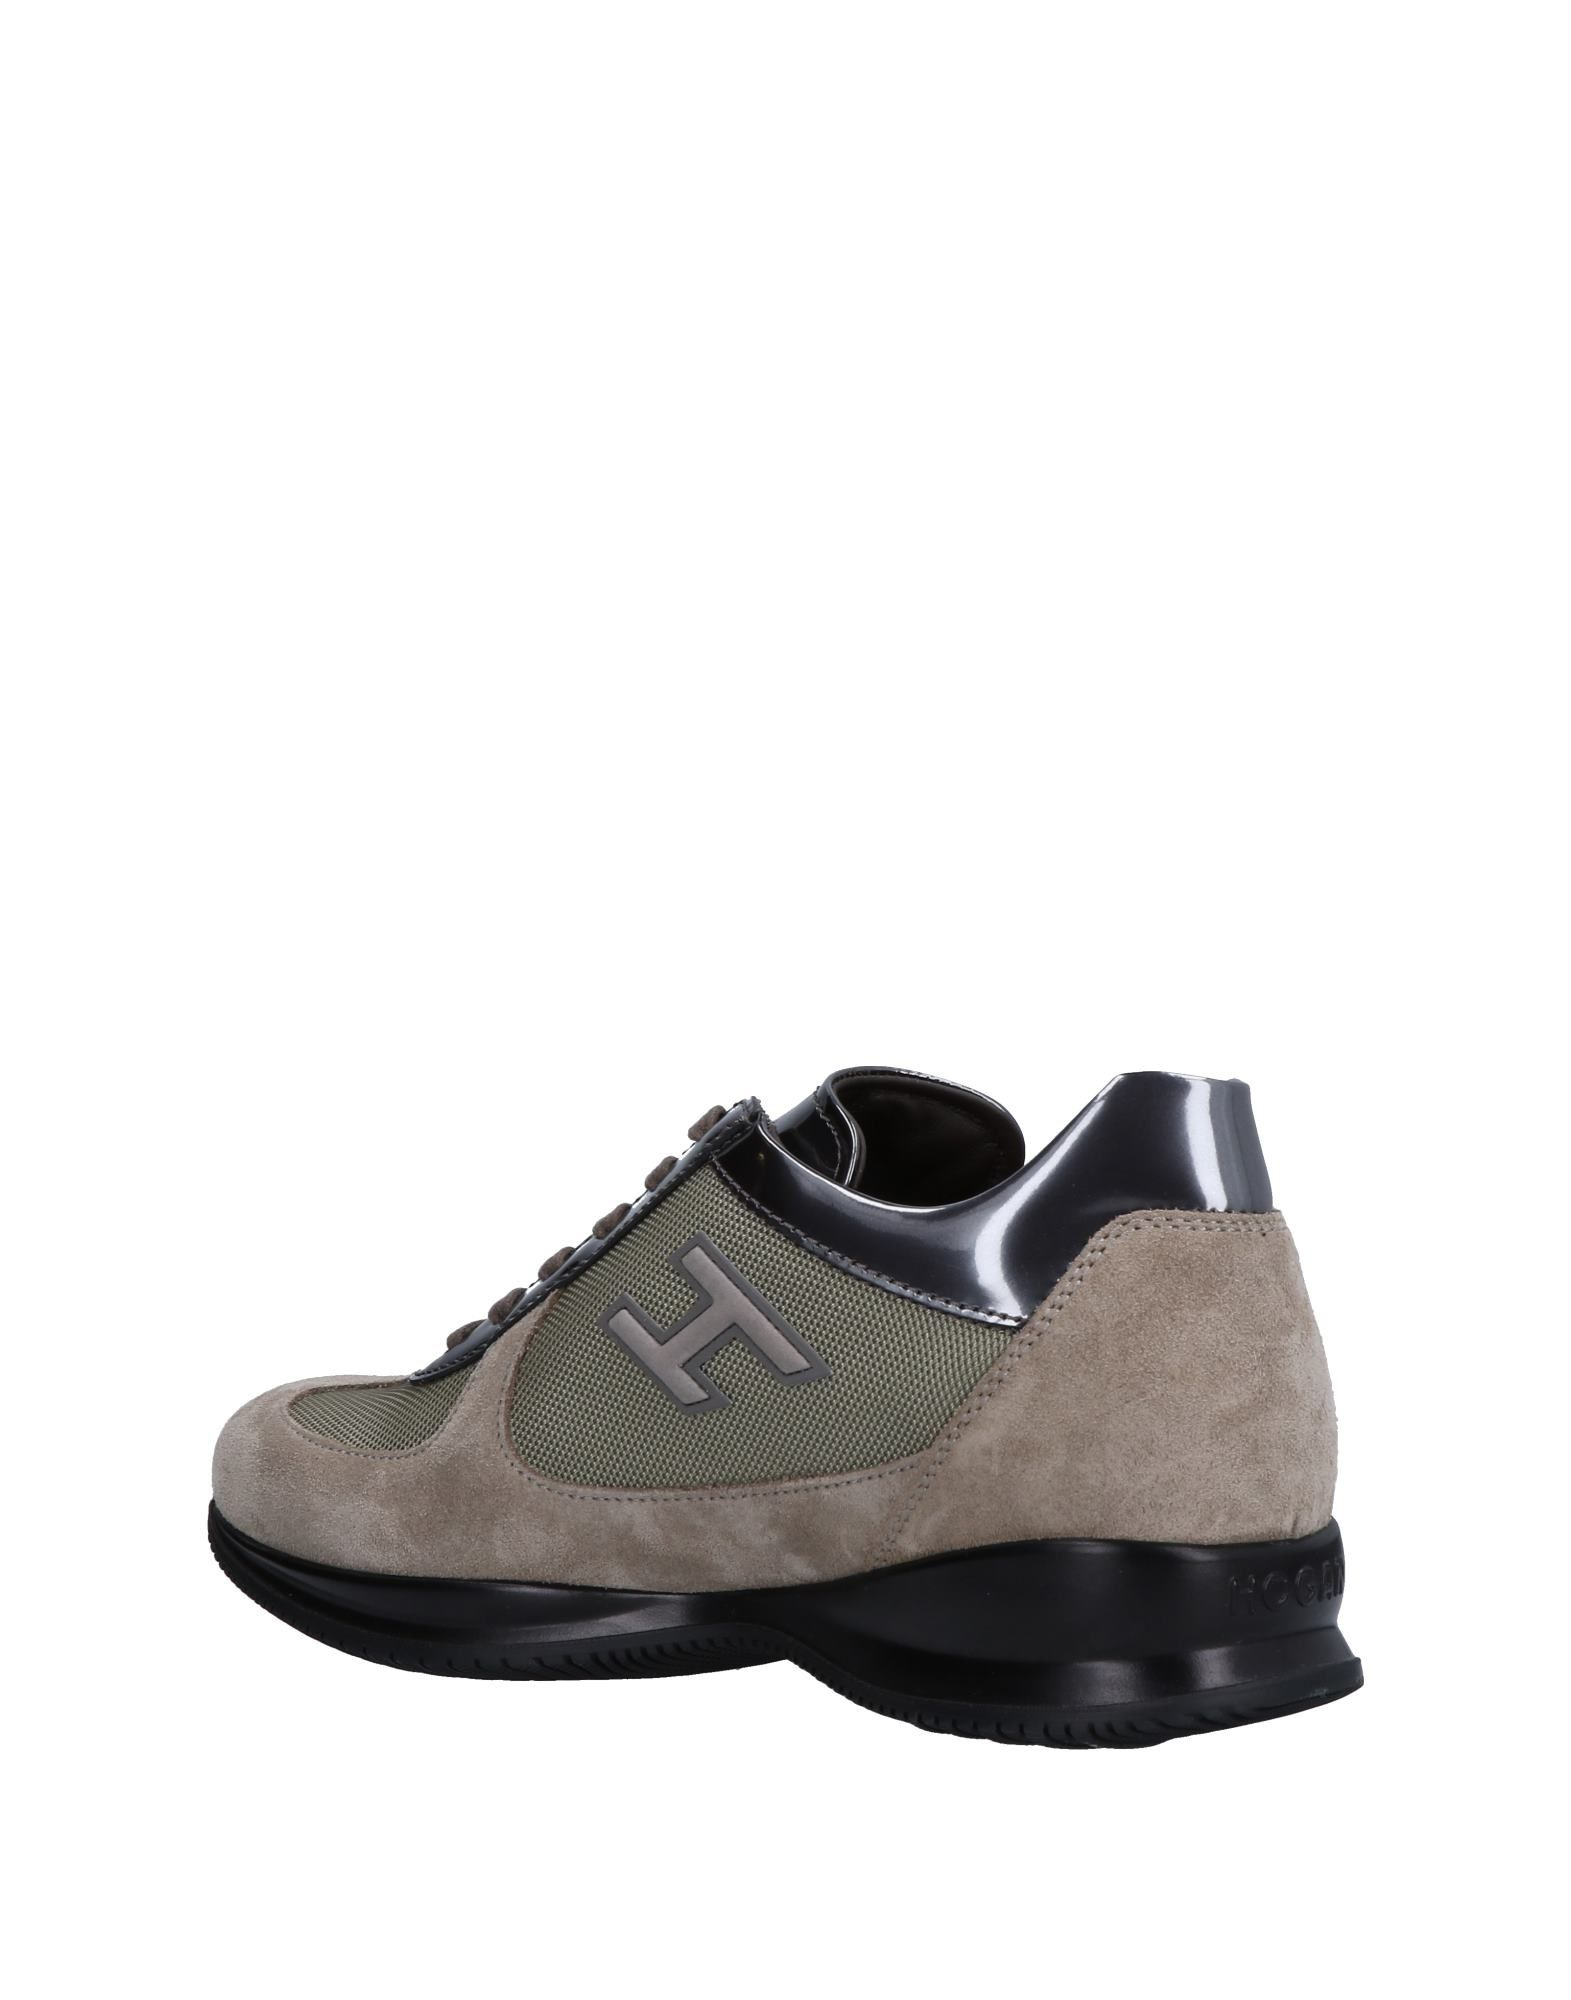 Hogan Sneakers Herren Qualität  11515140FC Gute Qualität Herren beliebte Schuhe 18b55c